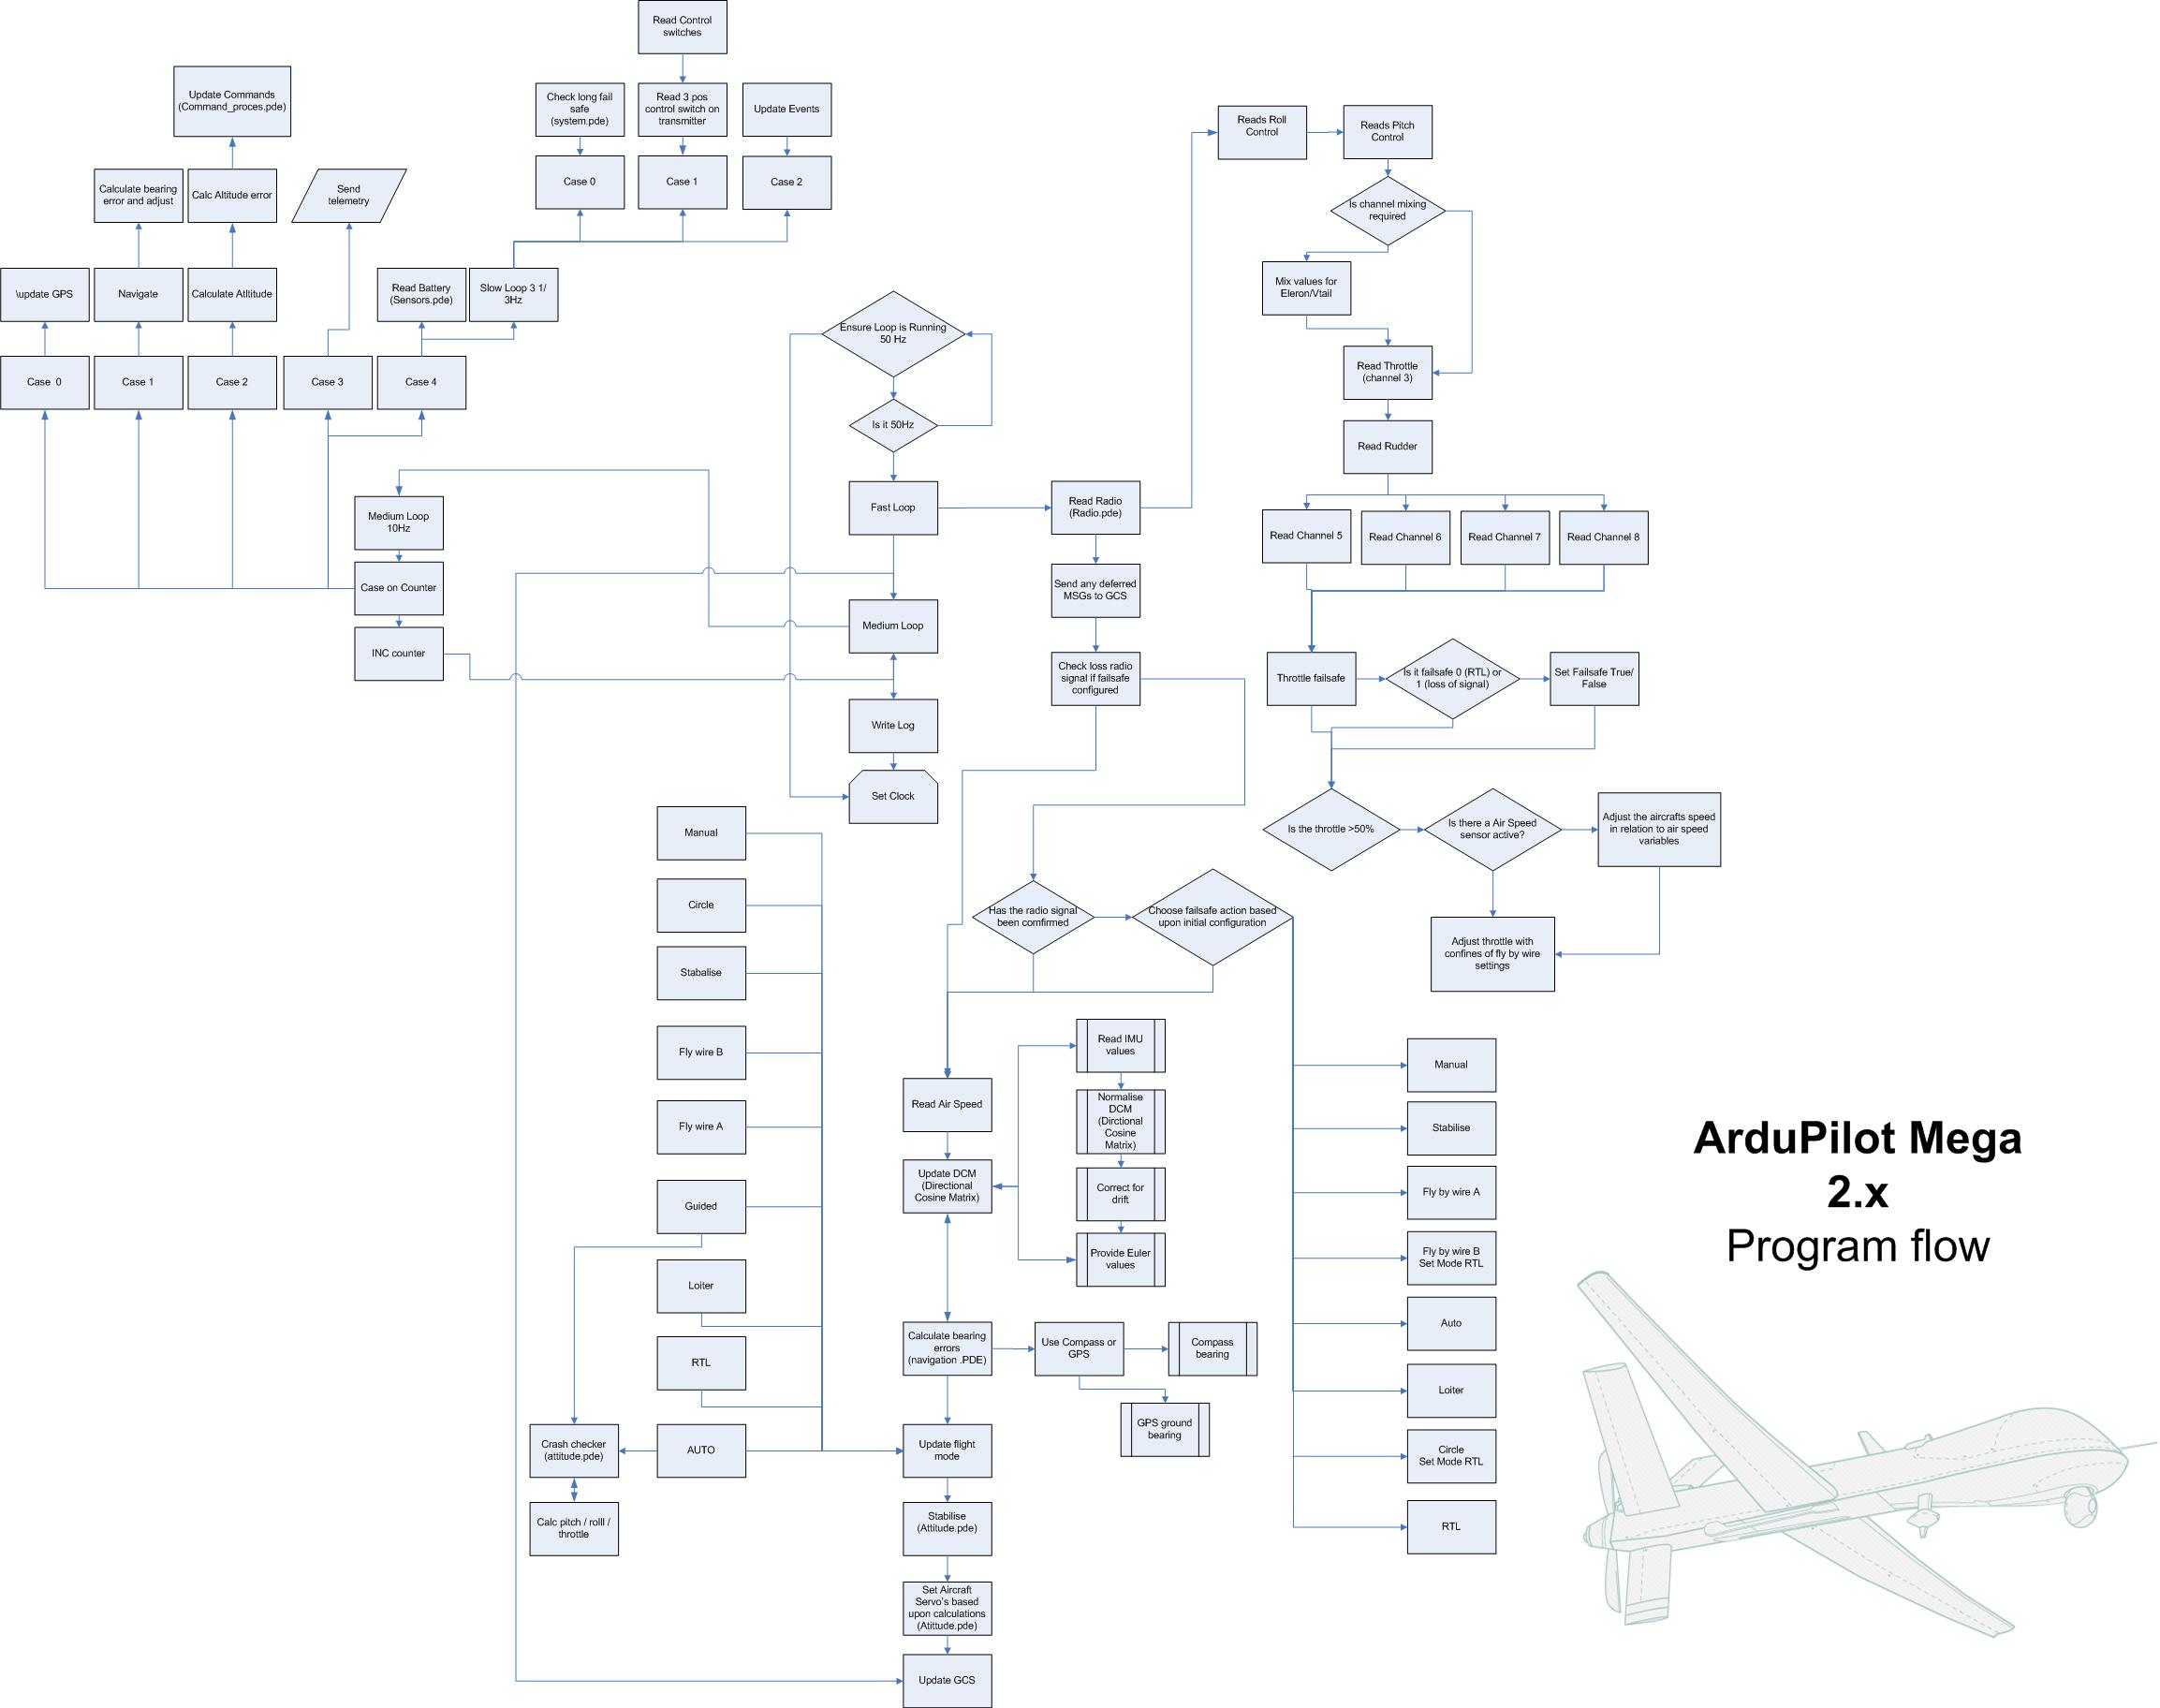 Ardupilot program flow diagram 2.x ASSISTANCE REQUIRED